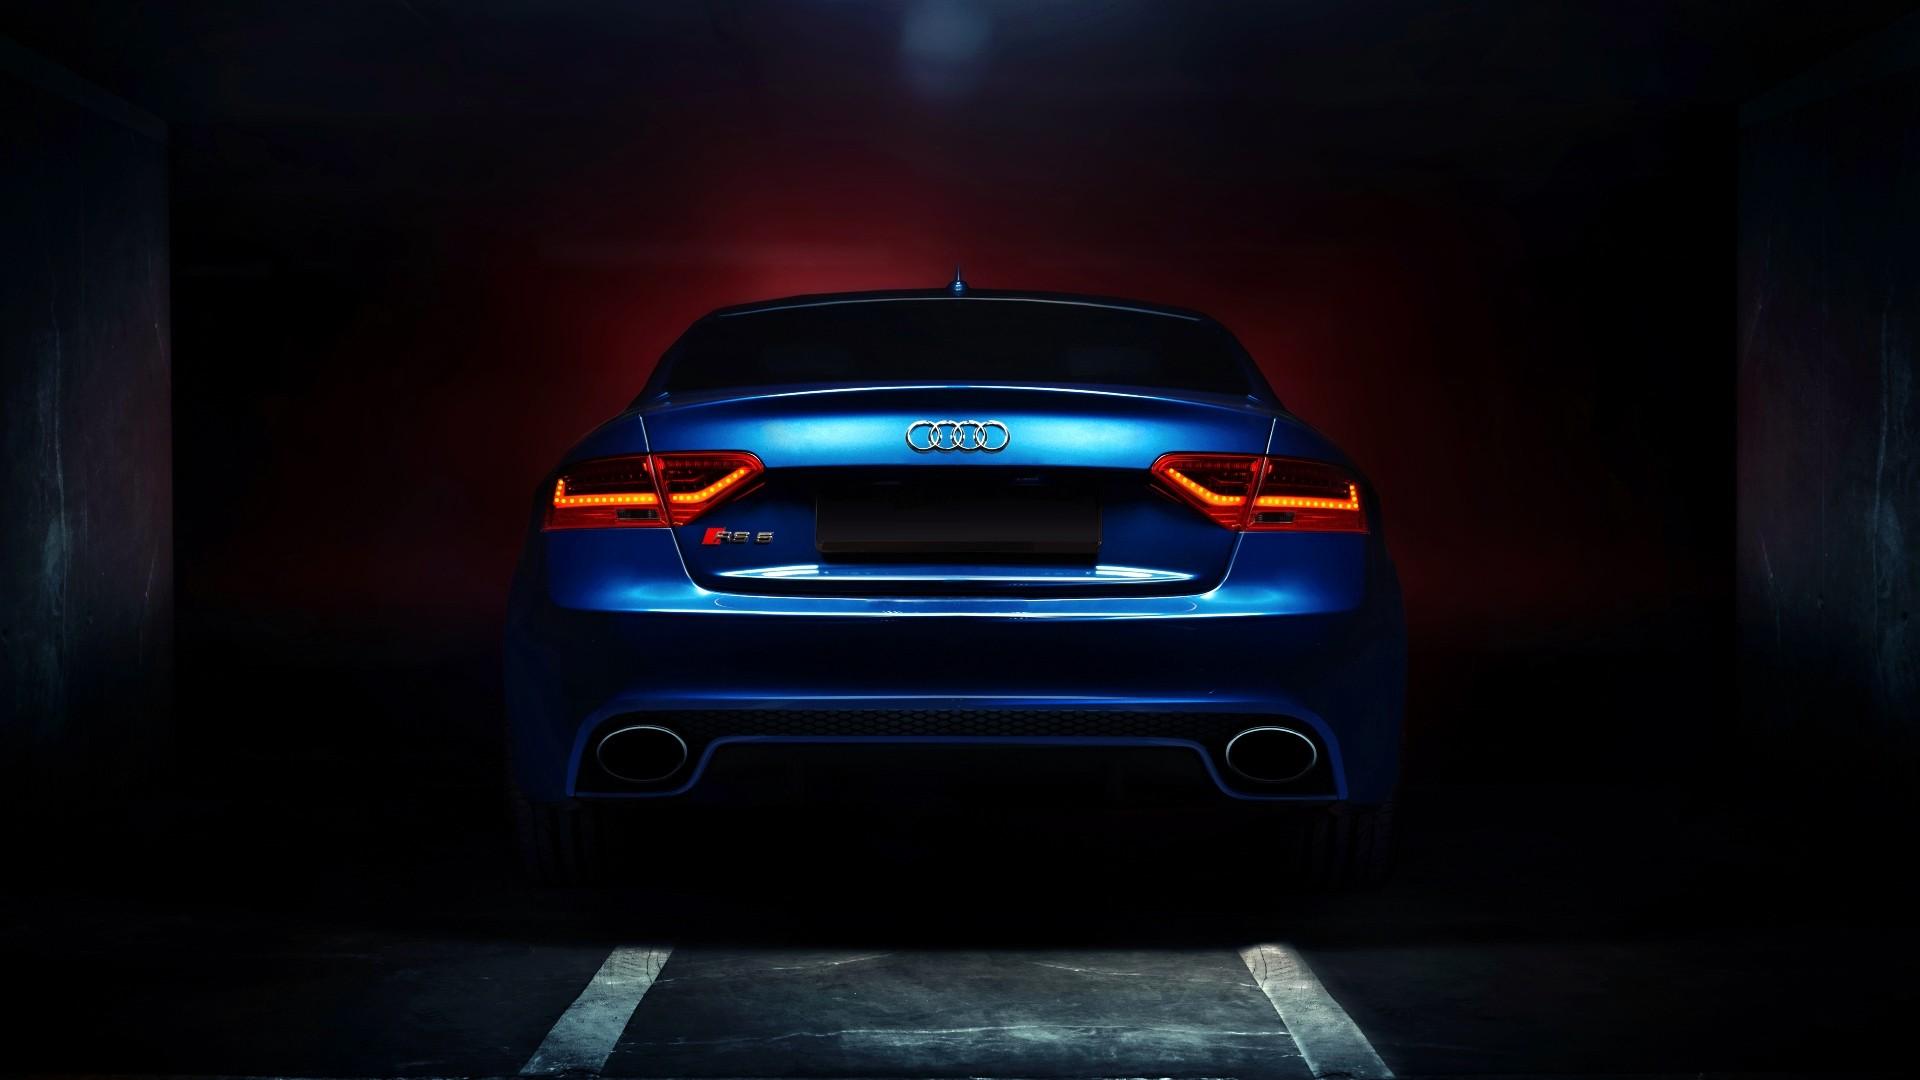 Audi Hd Logo 4k Image Background Photo Wallpaper